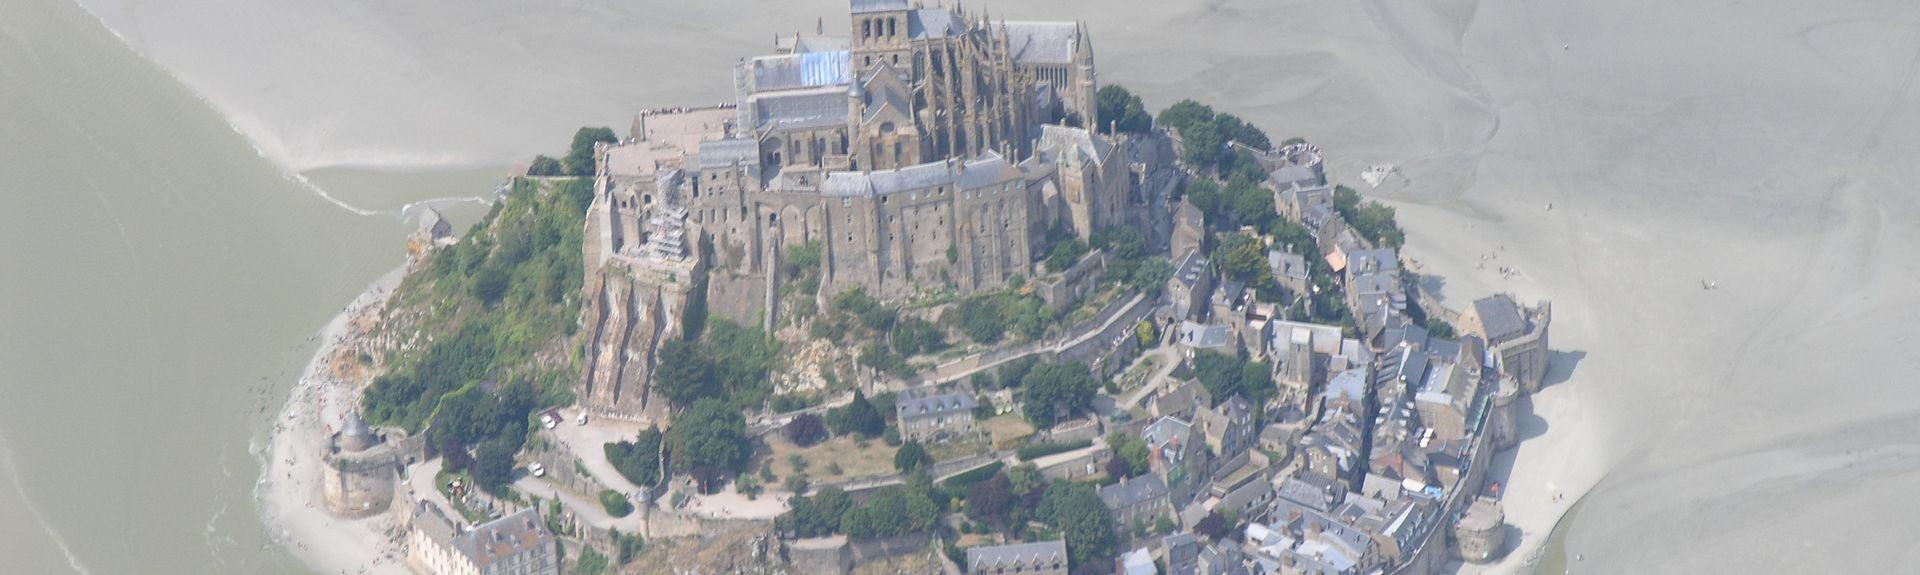 Saint-James, France